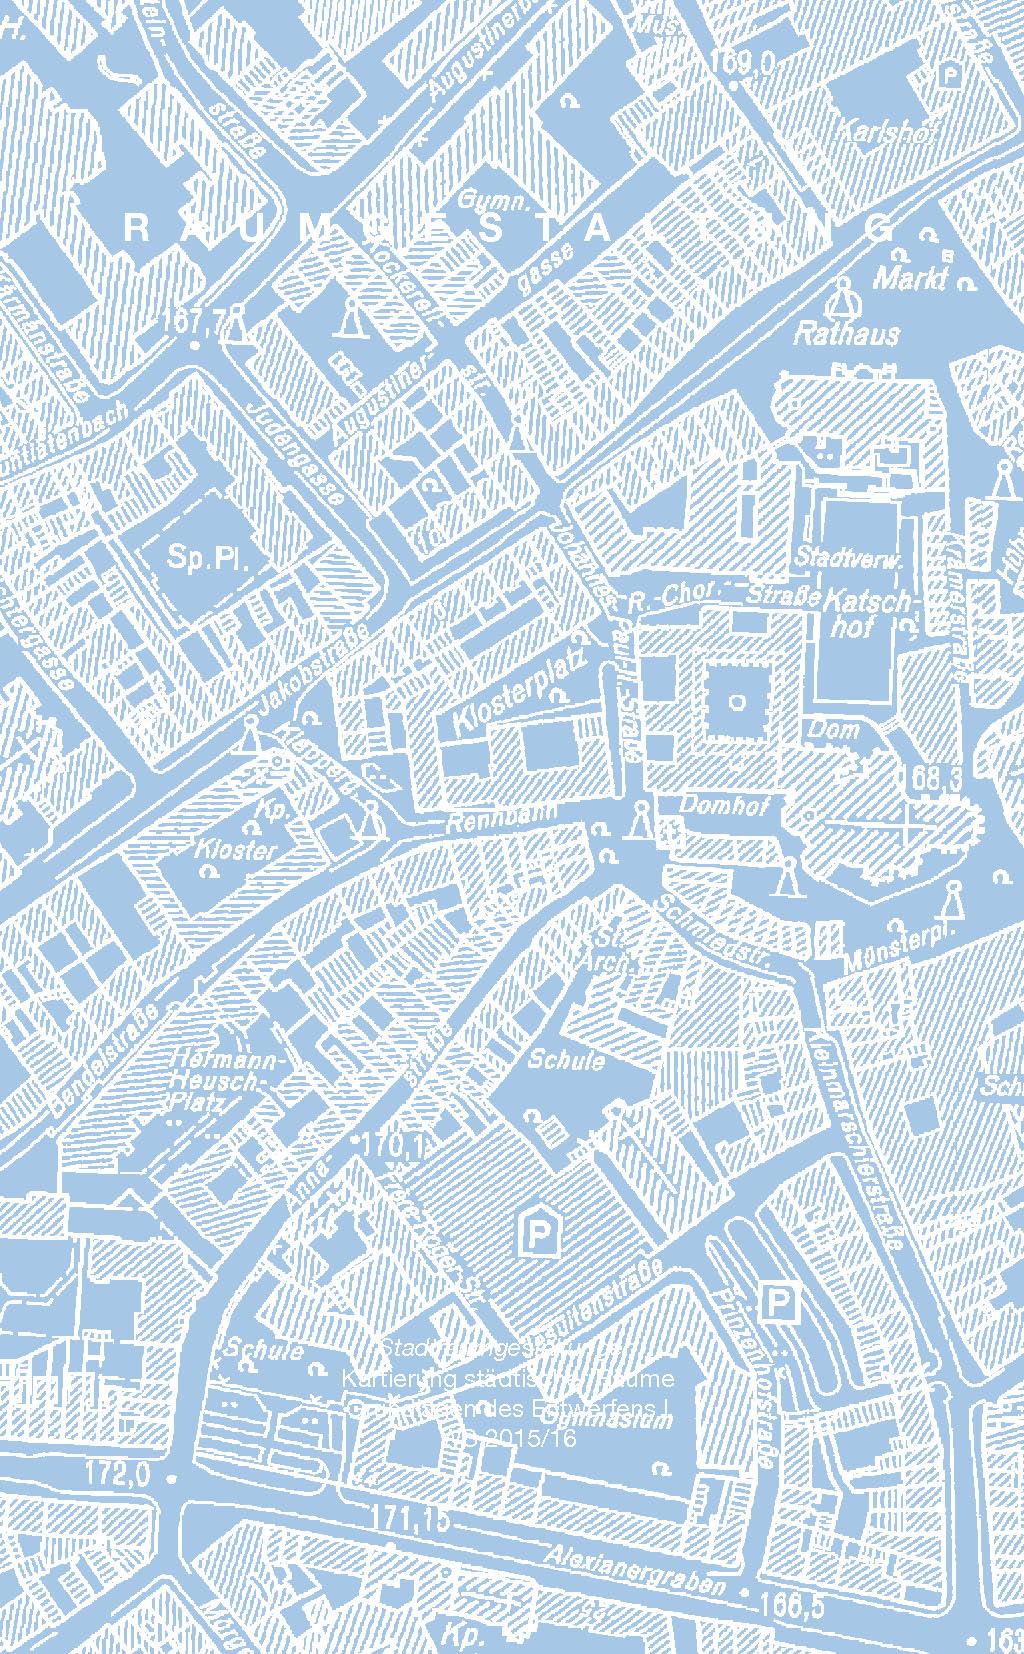 Raumgestaltung rwth ws 2015 16 ge grundlagen des for Raumgestaltung grundlagen